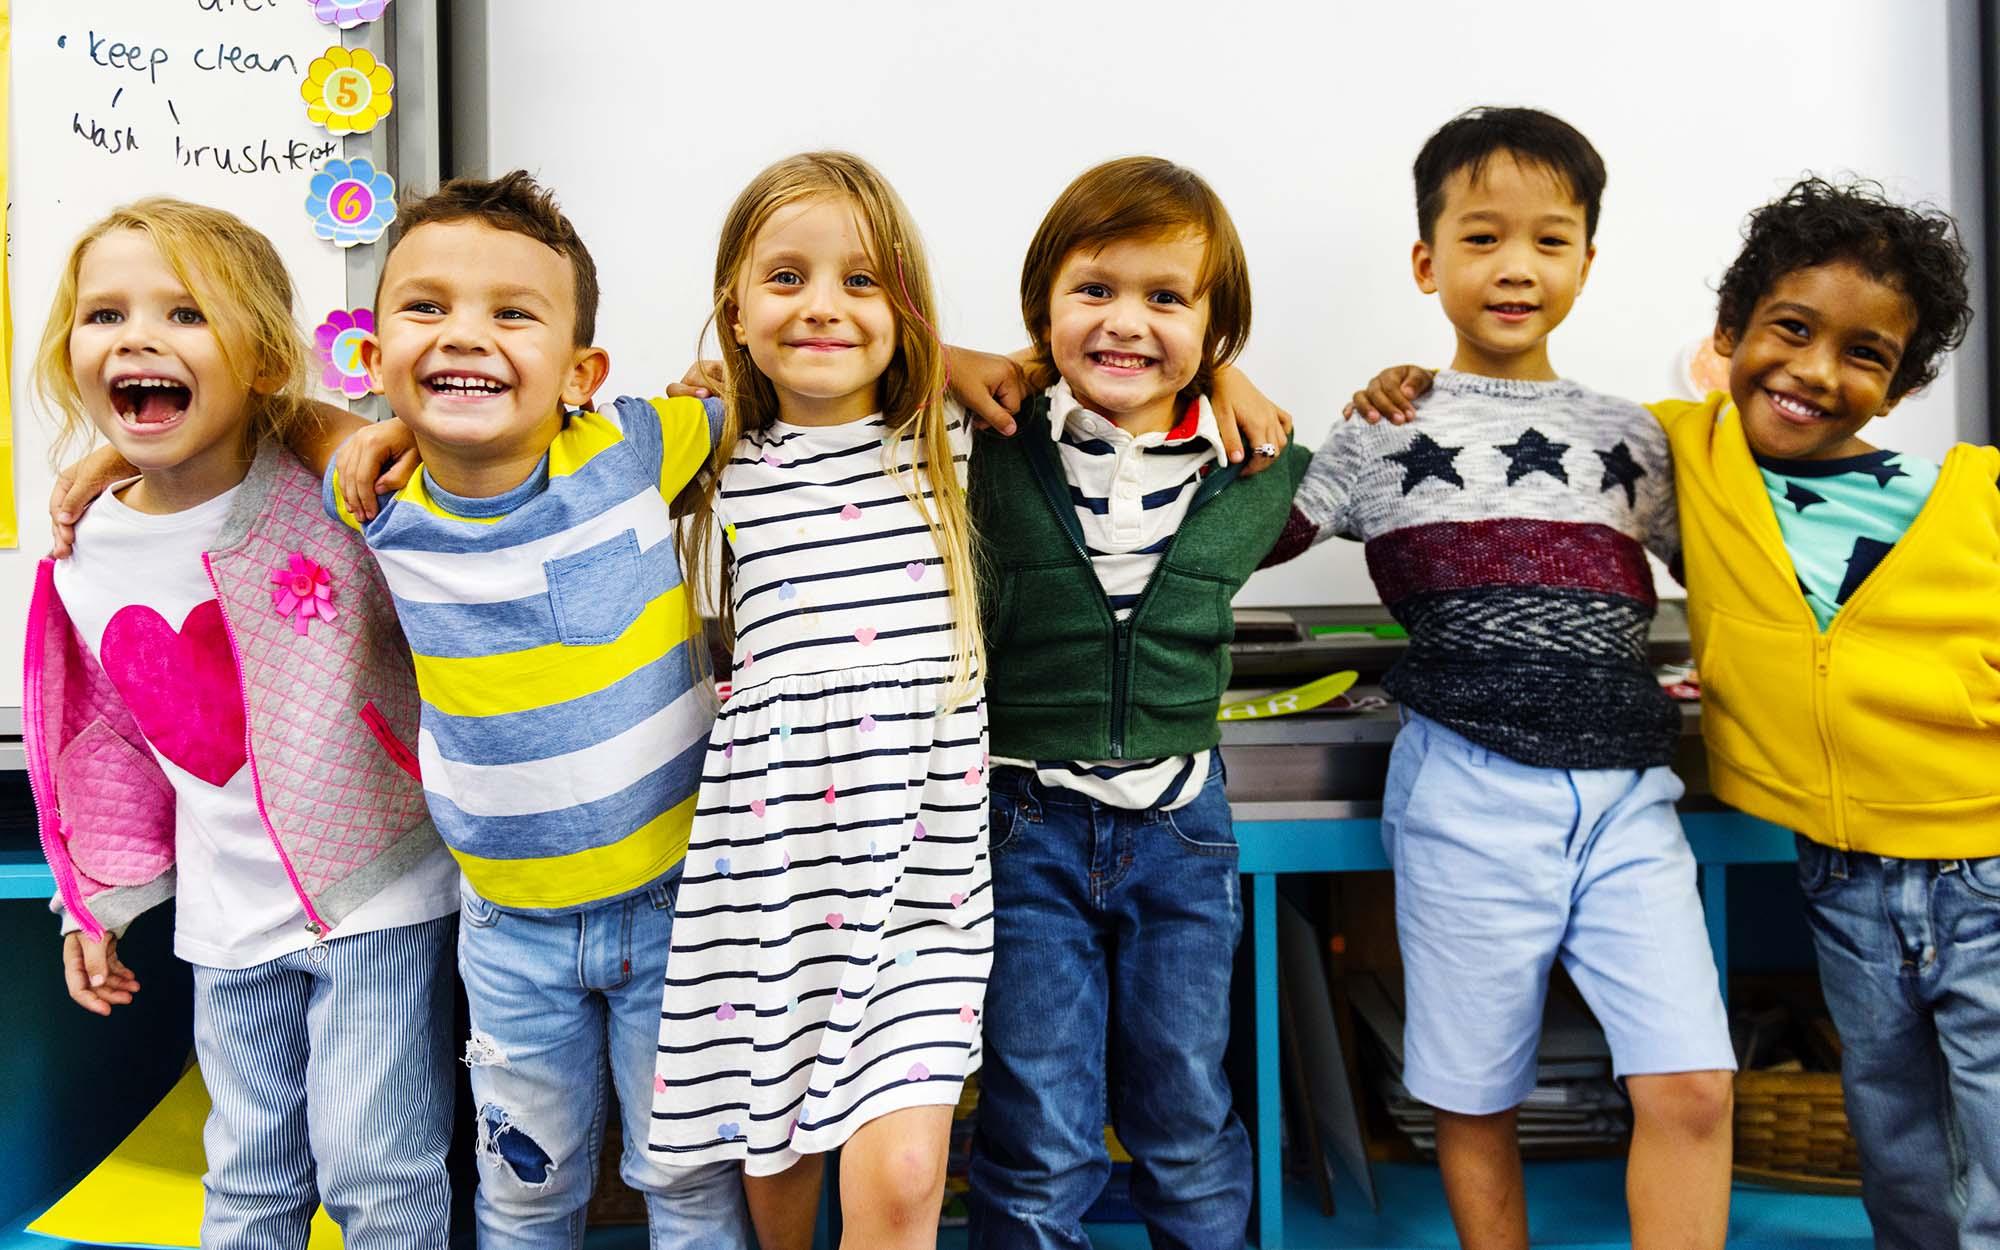 Heartland-Christian-Academy-Sharpsville-IN Daycare